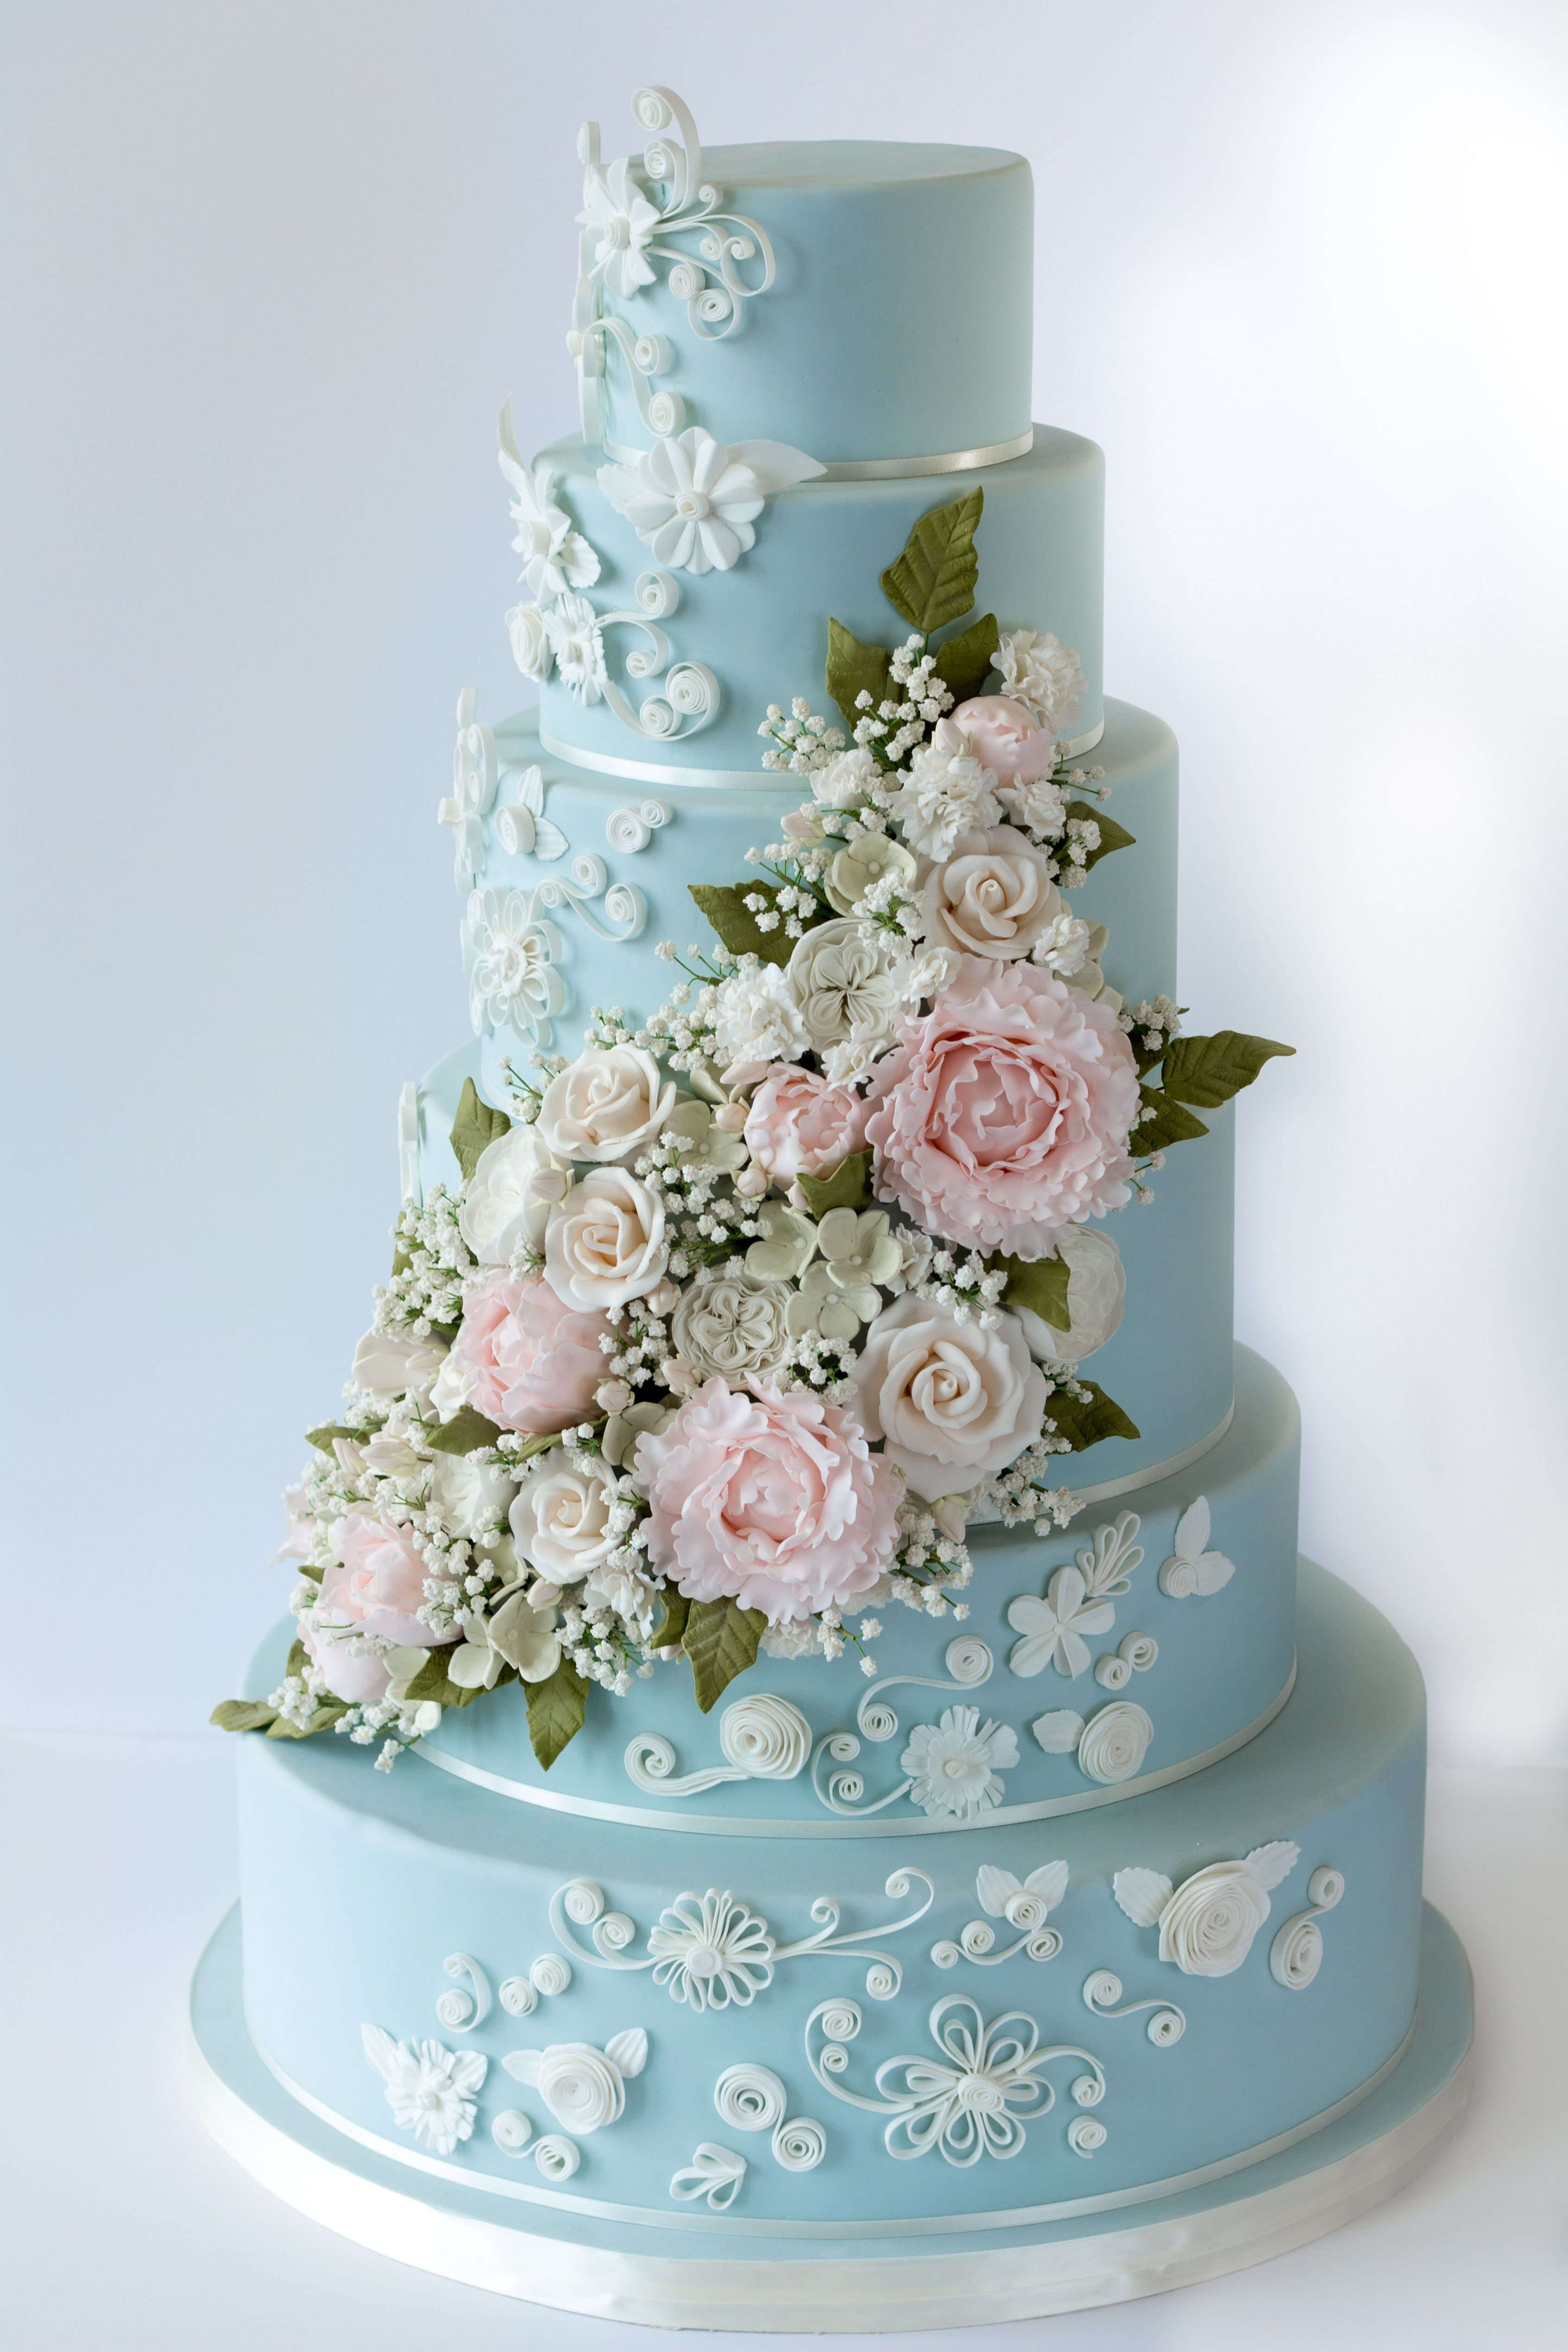 Wedding decorations nigeria  Amy Beck Cake Design  Chicago IL  ybeckcakedesign